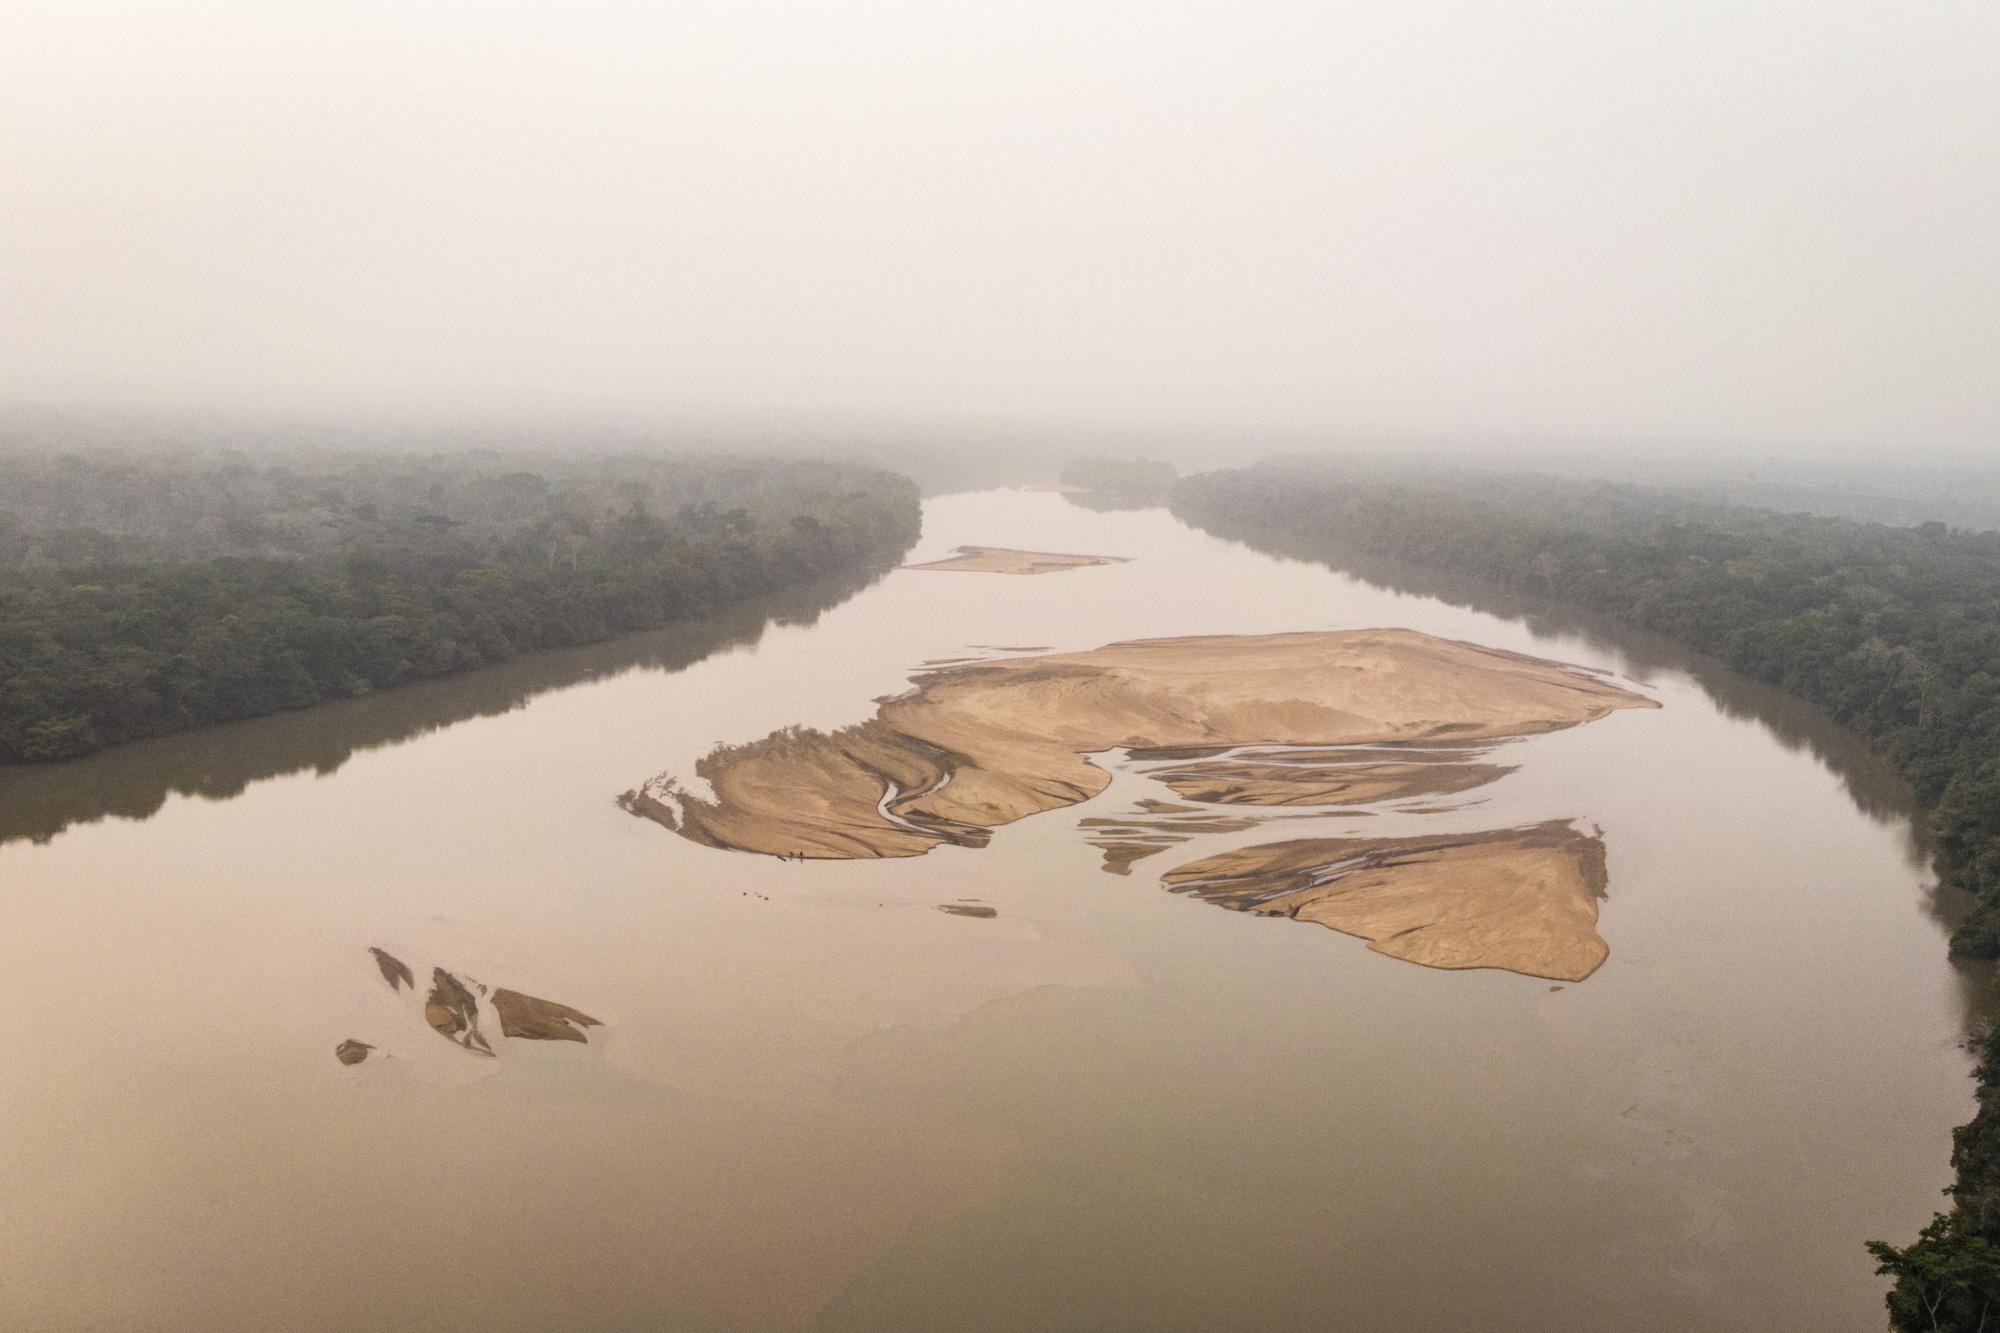 FLORENT VERGNES / AFP